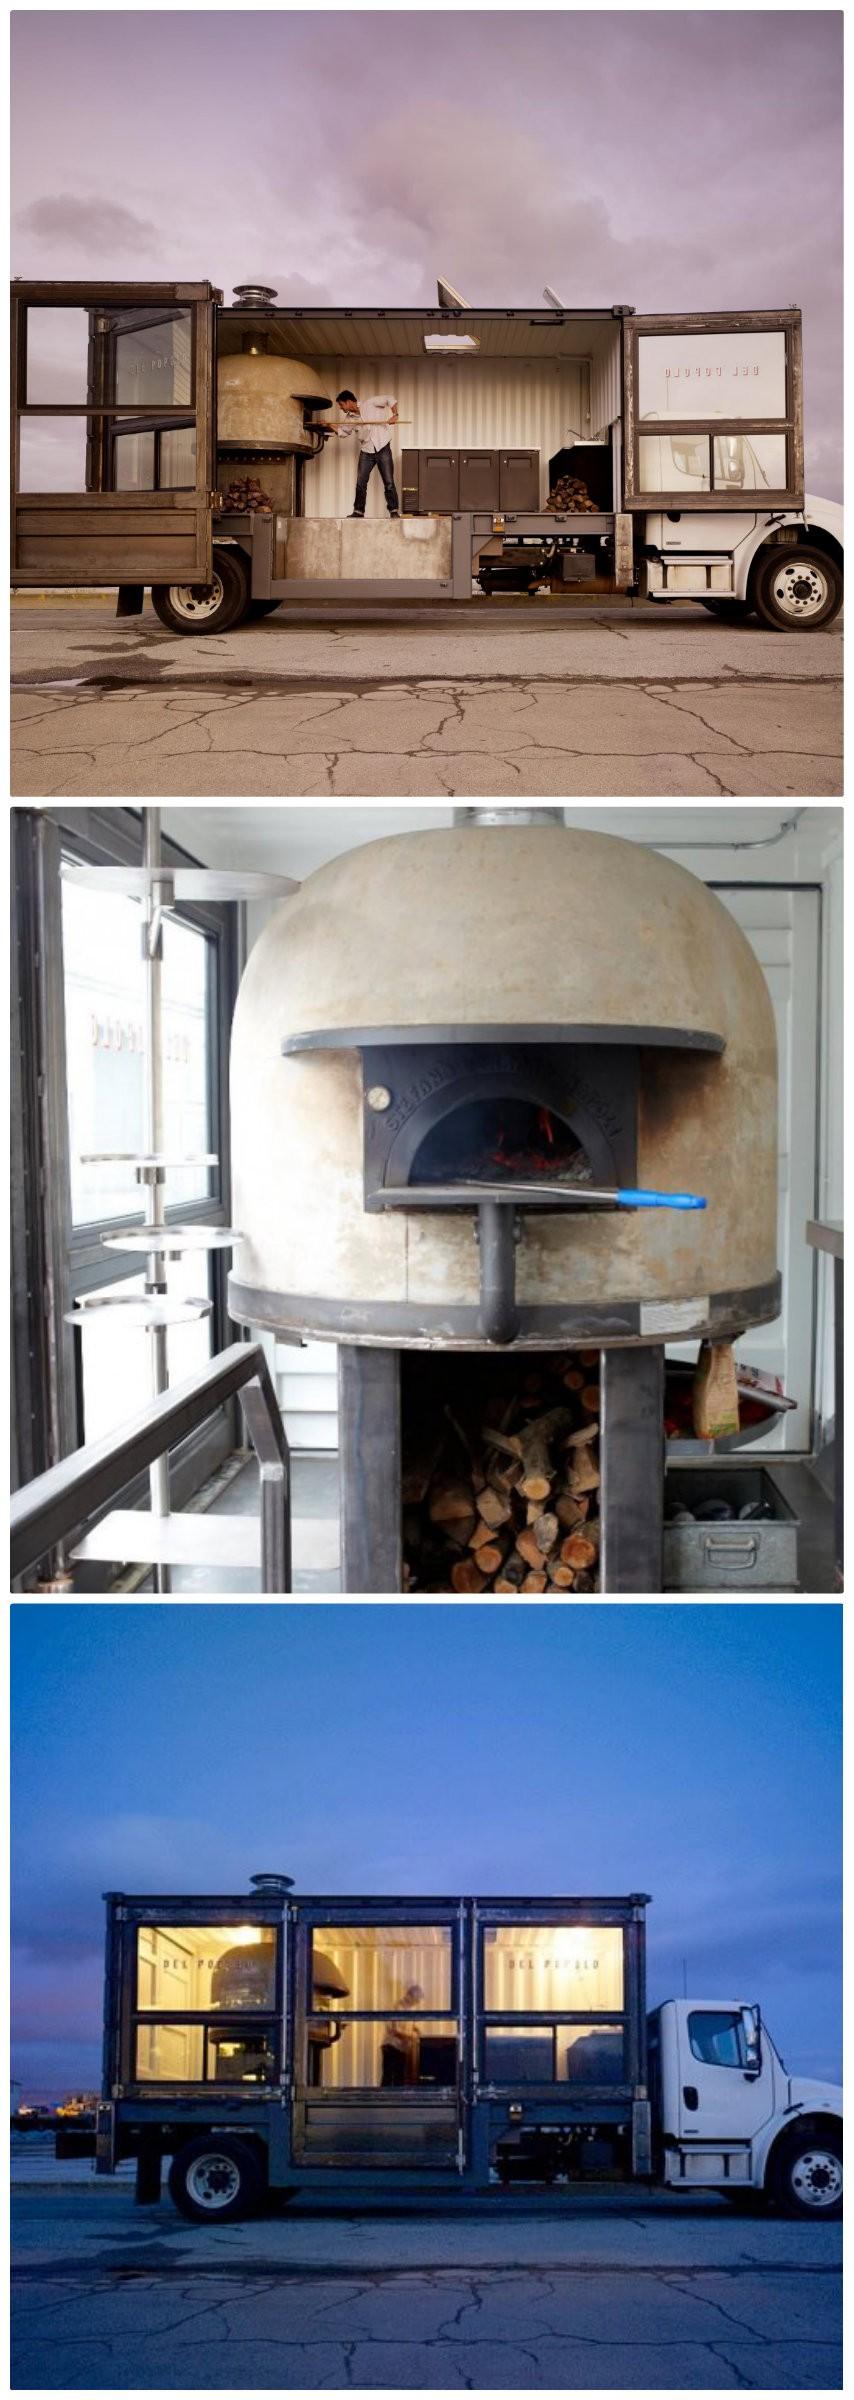 6. Del Popolo的披薩卡車:美國舊金山(San Francisco)